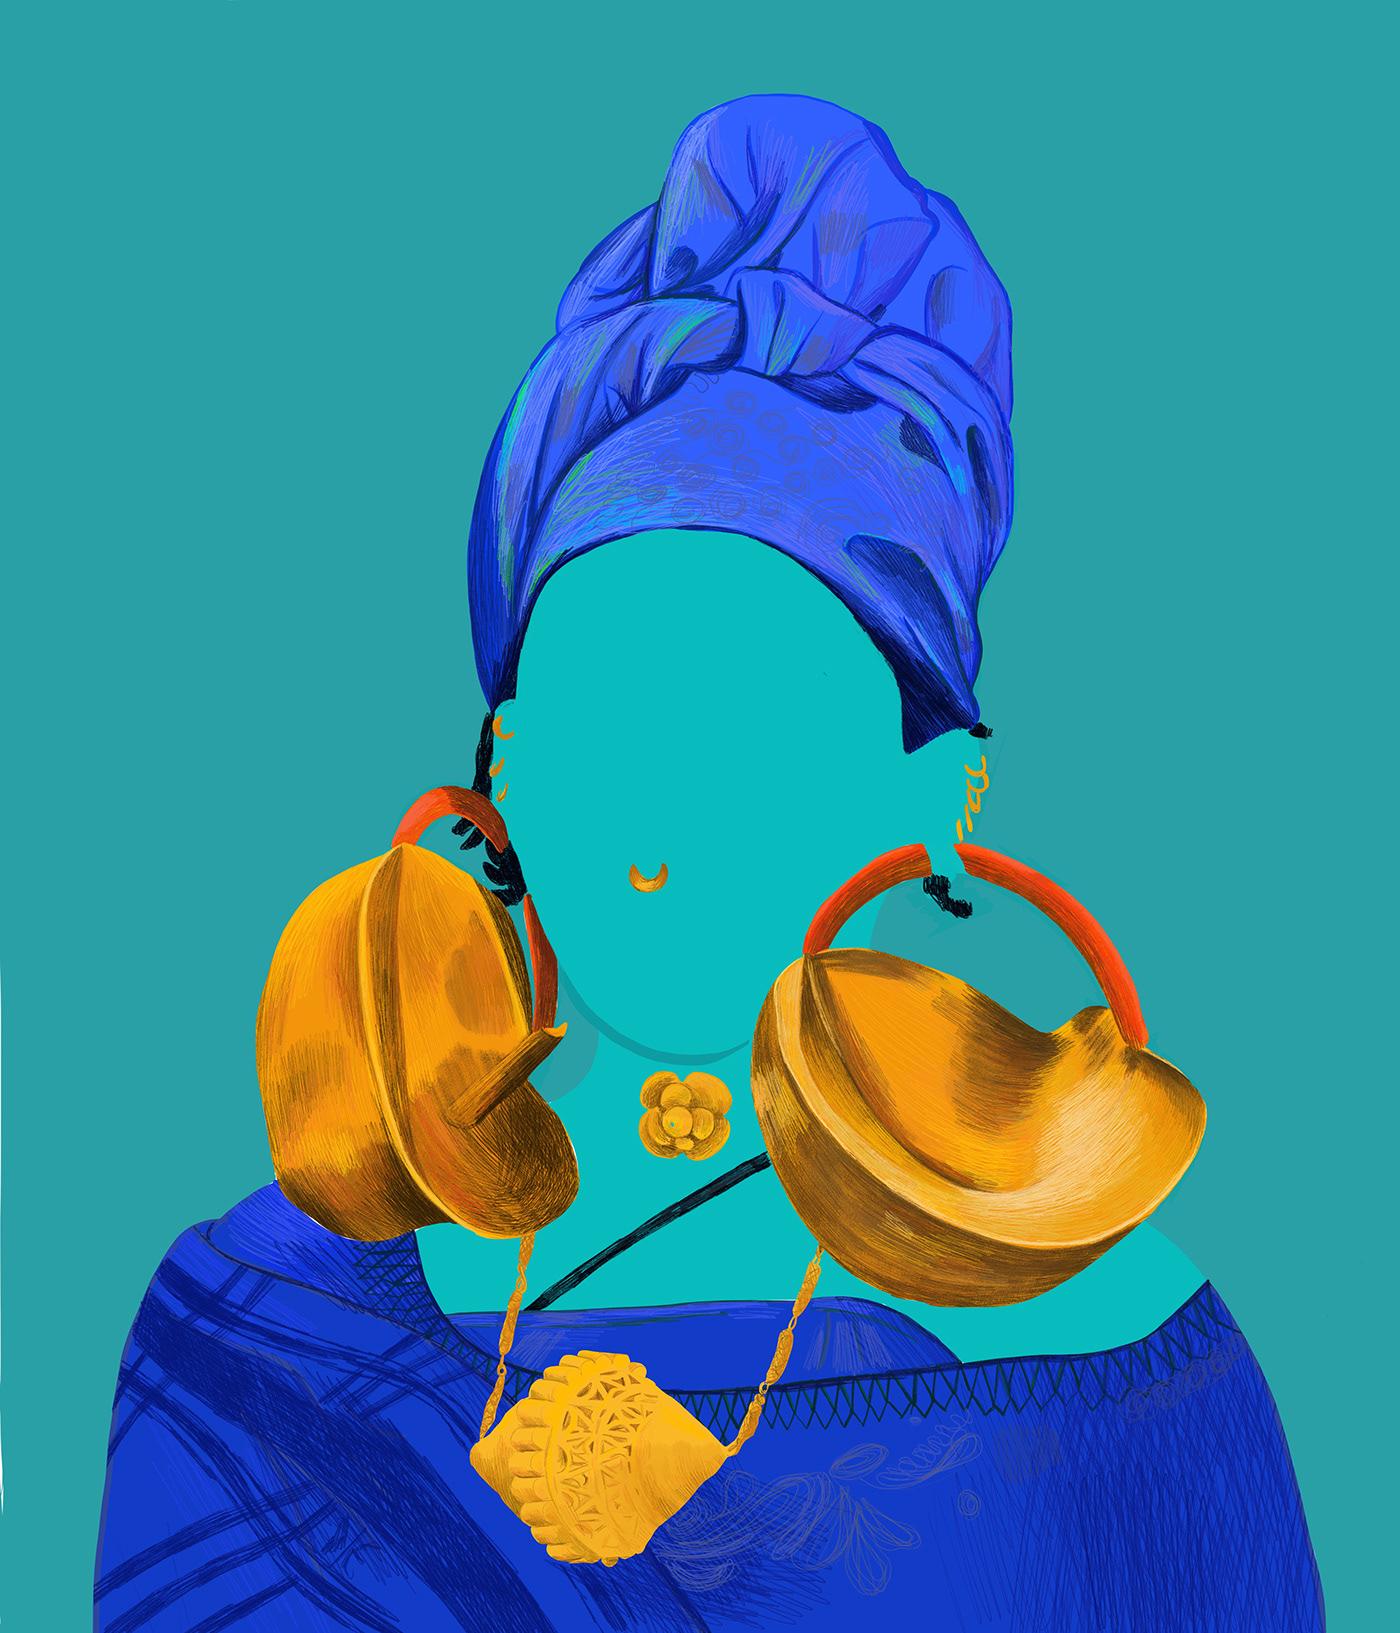 color culture empowerment feminine women